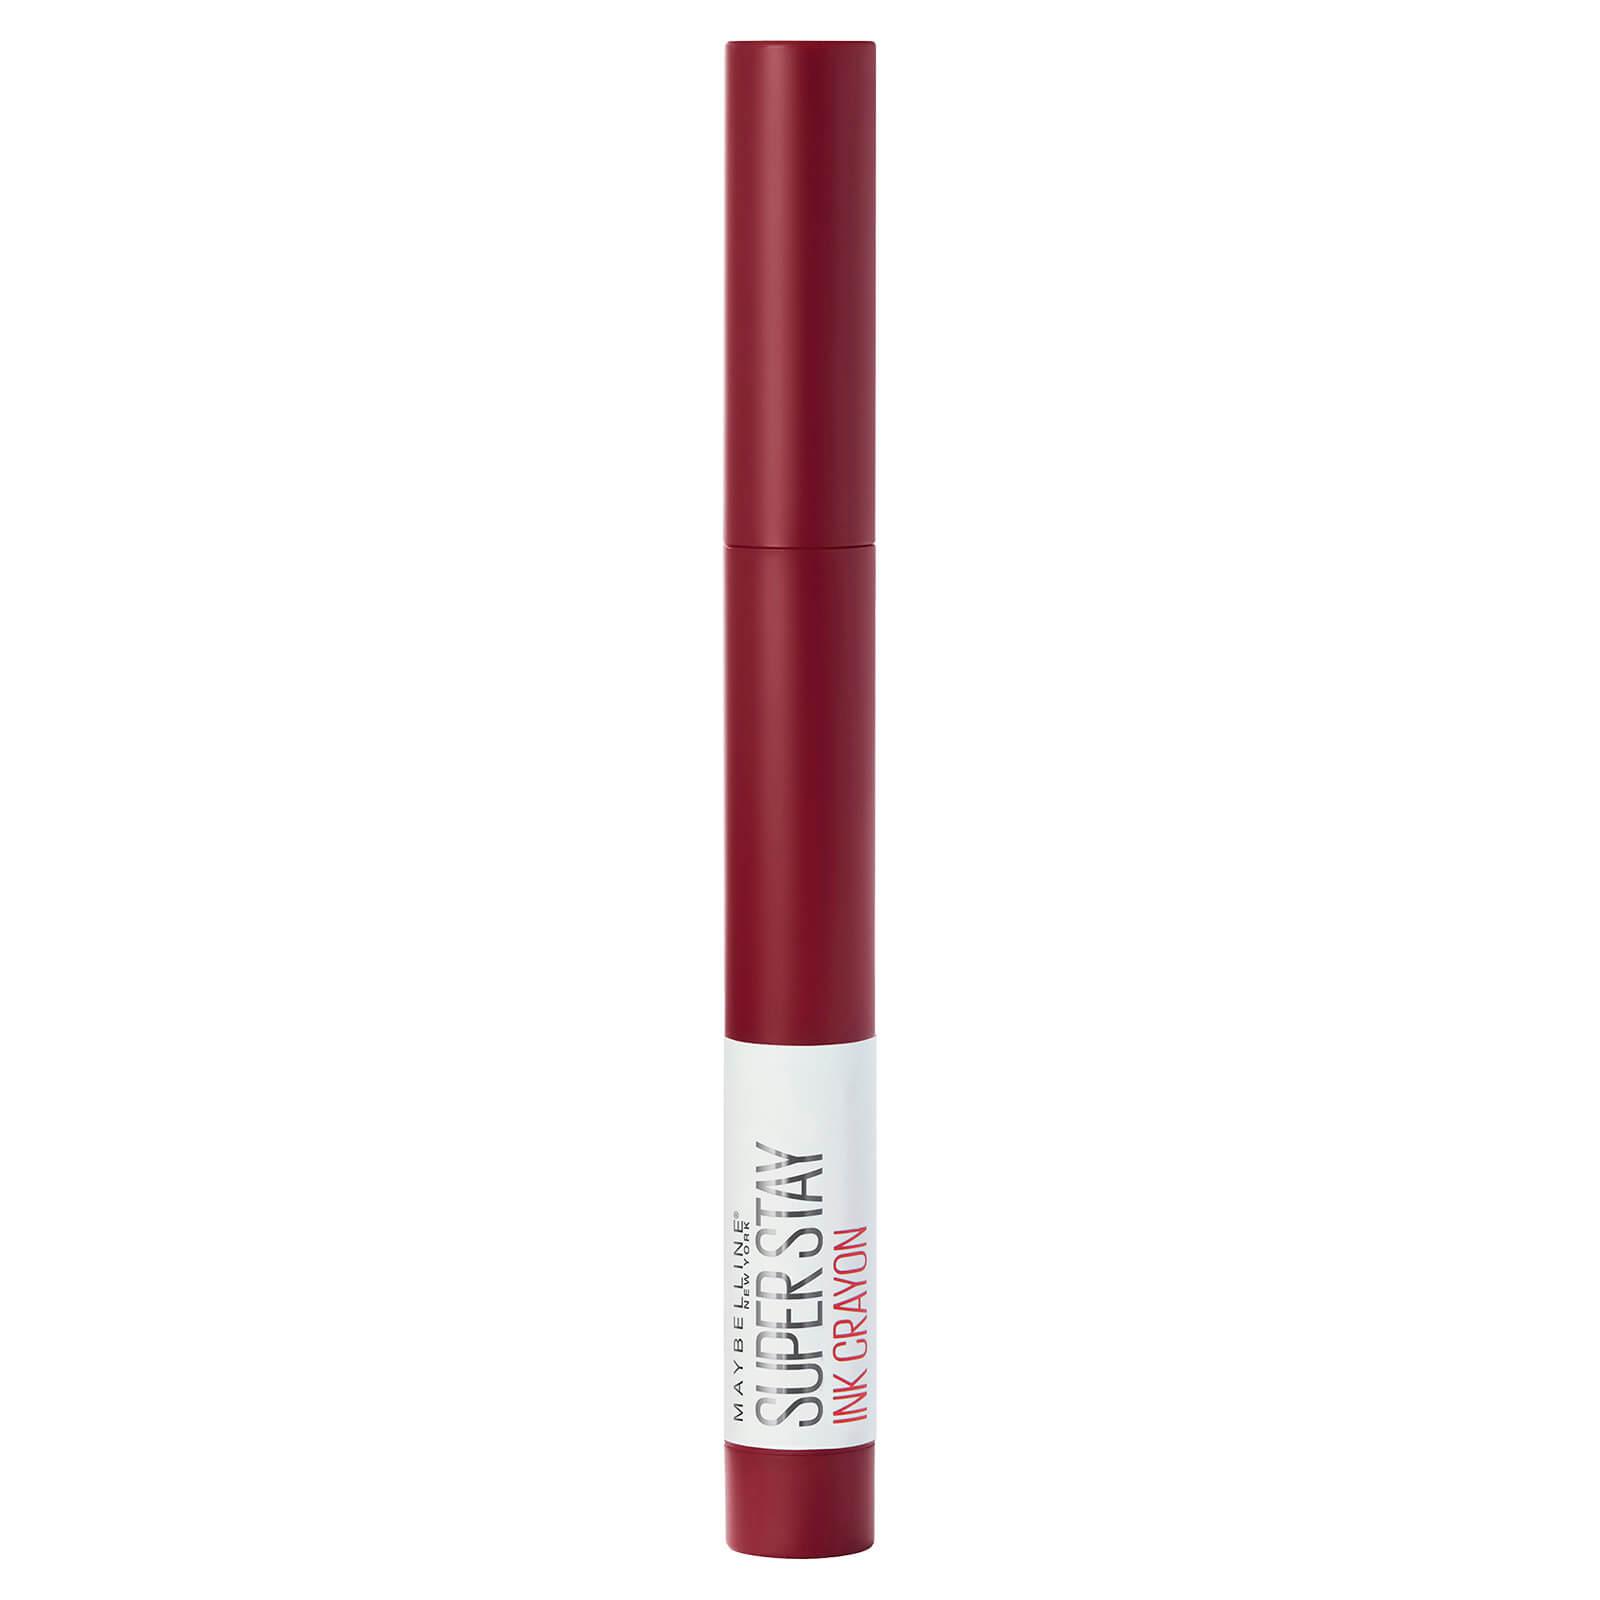 Купить Maybelline Superstay Matte Ink Crayon Lipstick 32g (Various Shades) - 55 Make it Happen